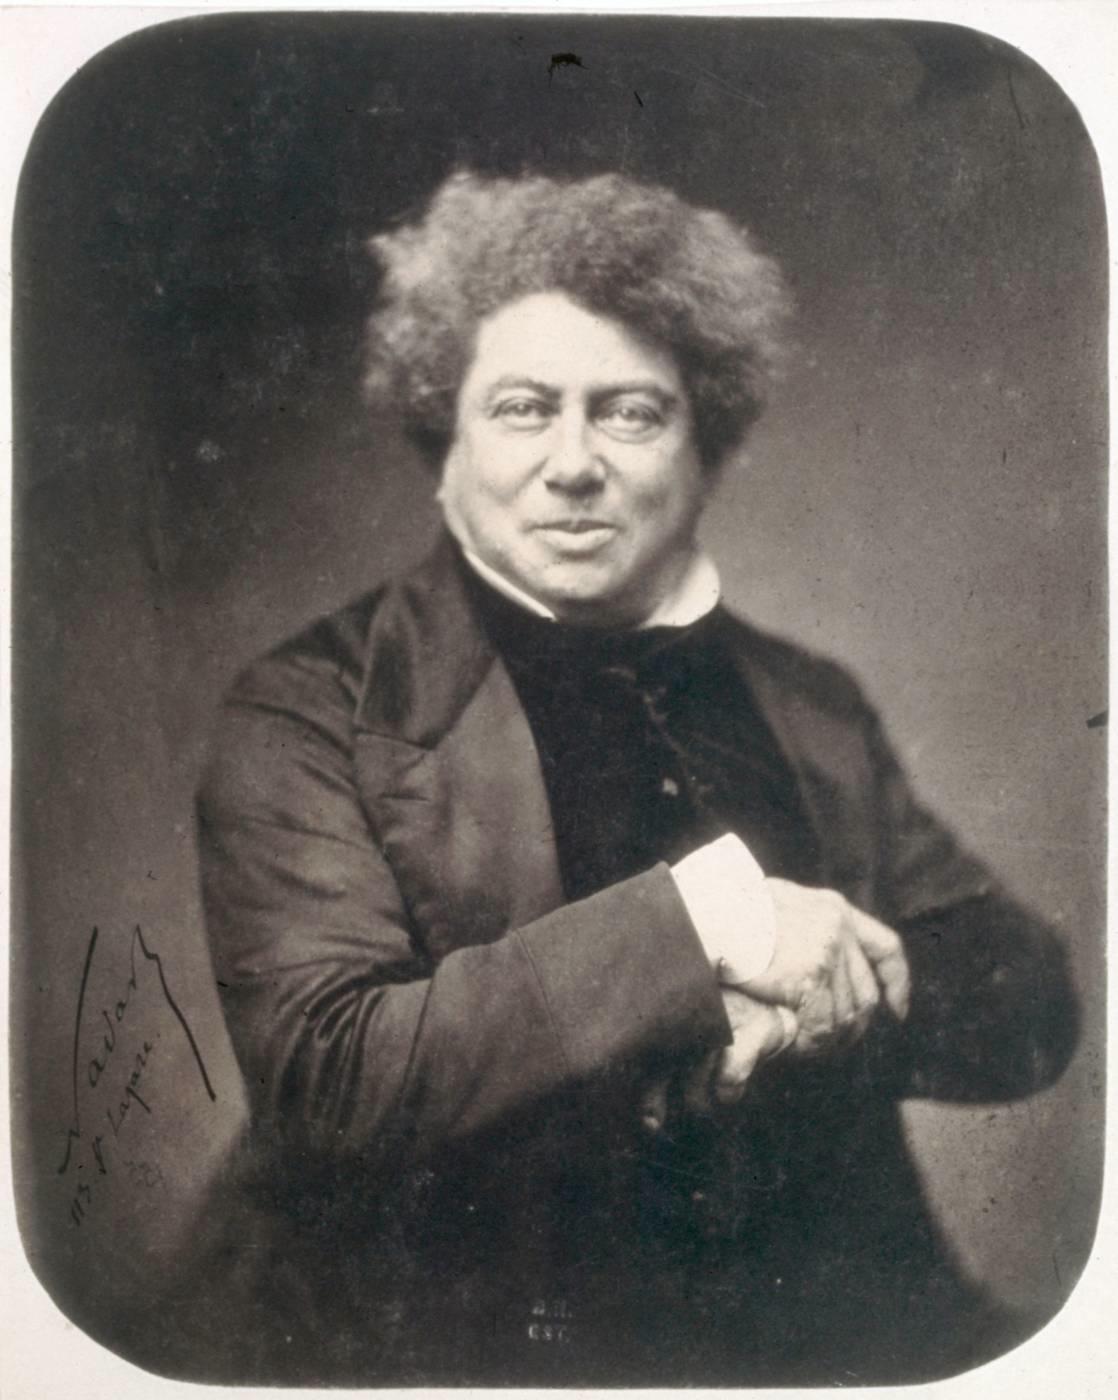 Resultado de imagen de alejandro dumas Alexandre Dumas - Portrait d 27Alexandre Dumas par Nadar 2C 1855 - Alexandre Dumas